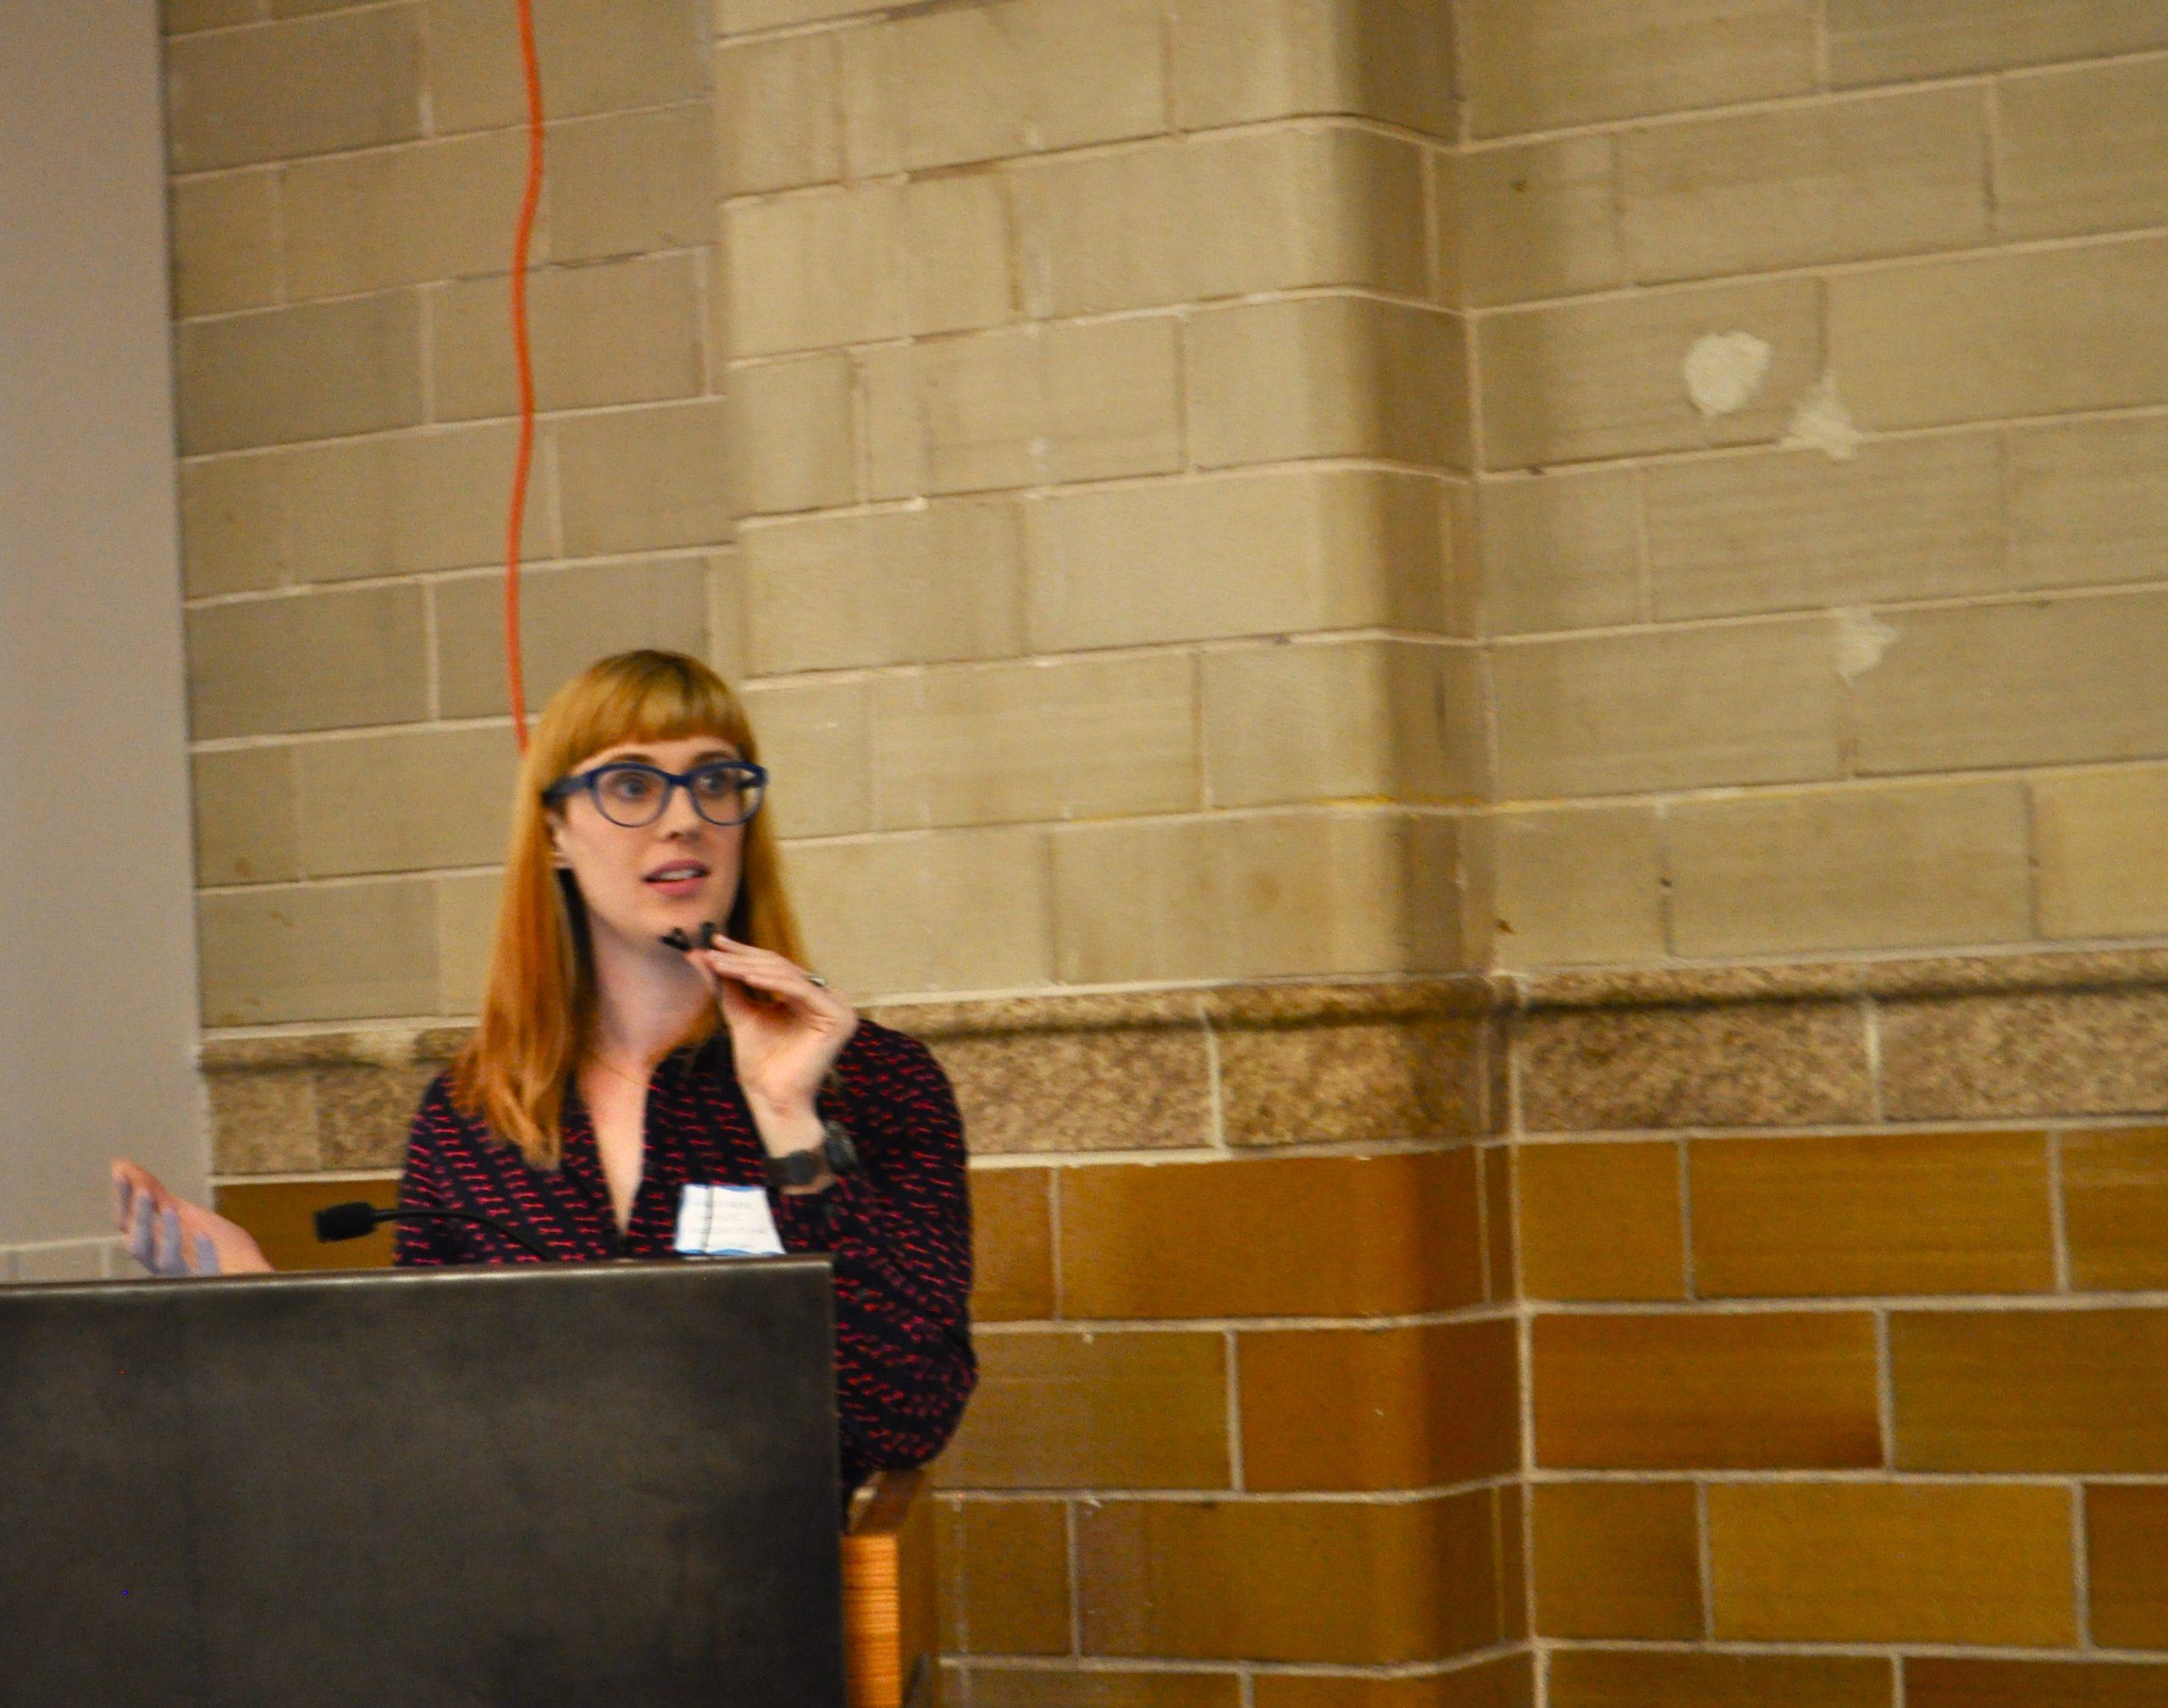 Heather Holdridge, Lake/Flato Architects sustainability manager, outlines the San Antonio 2030 District plan. Photo by Iris Dimmick.